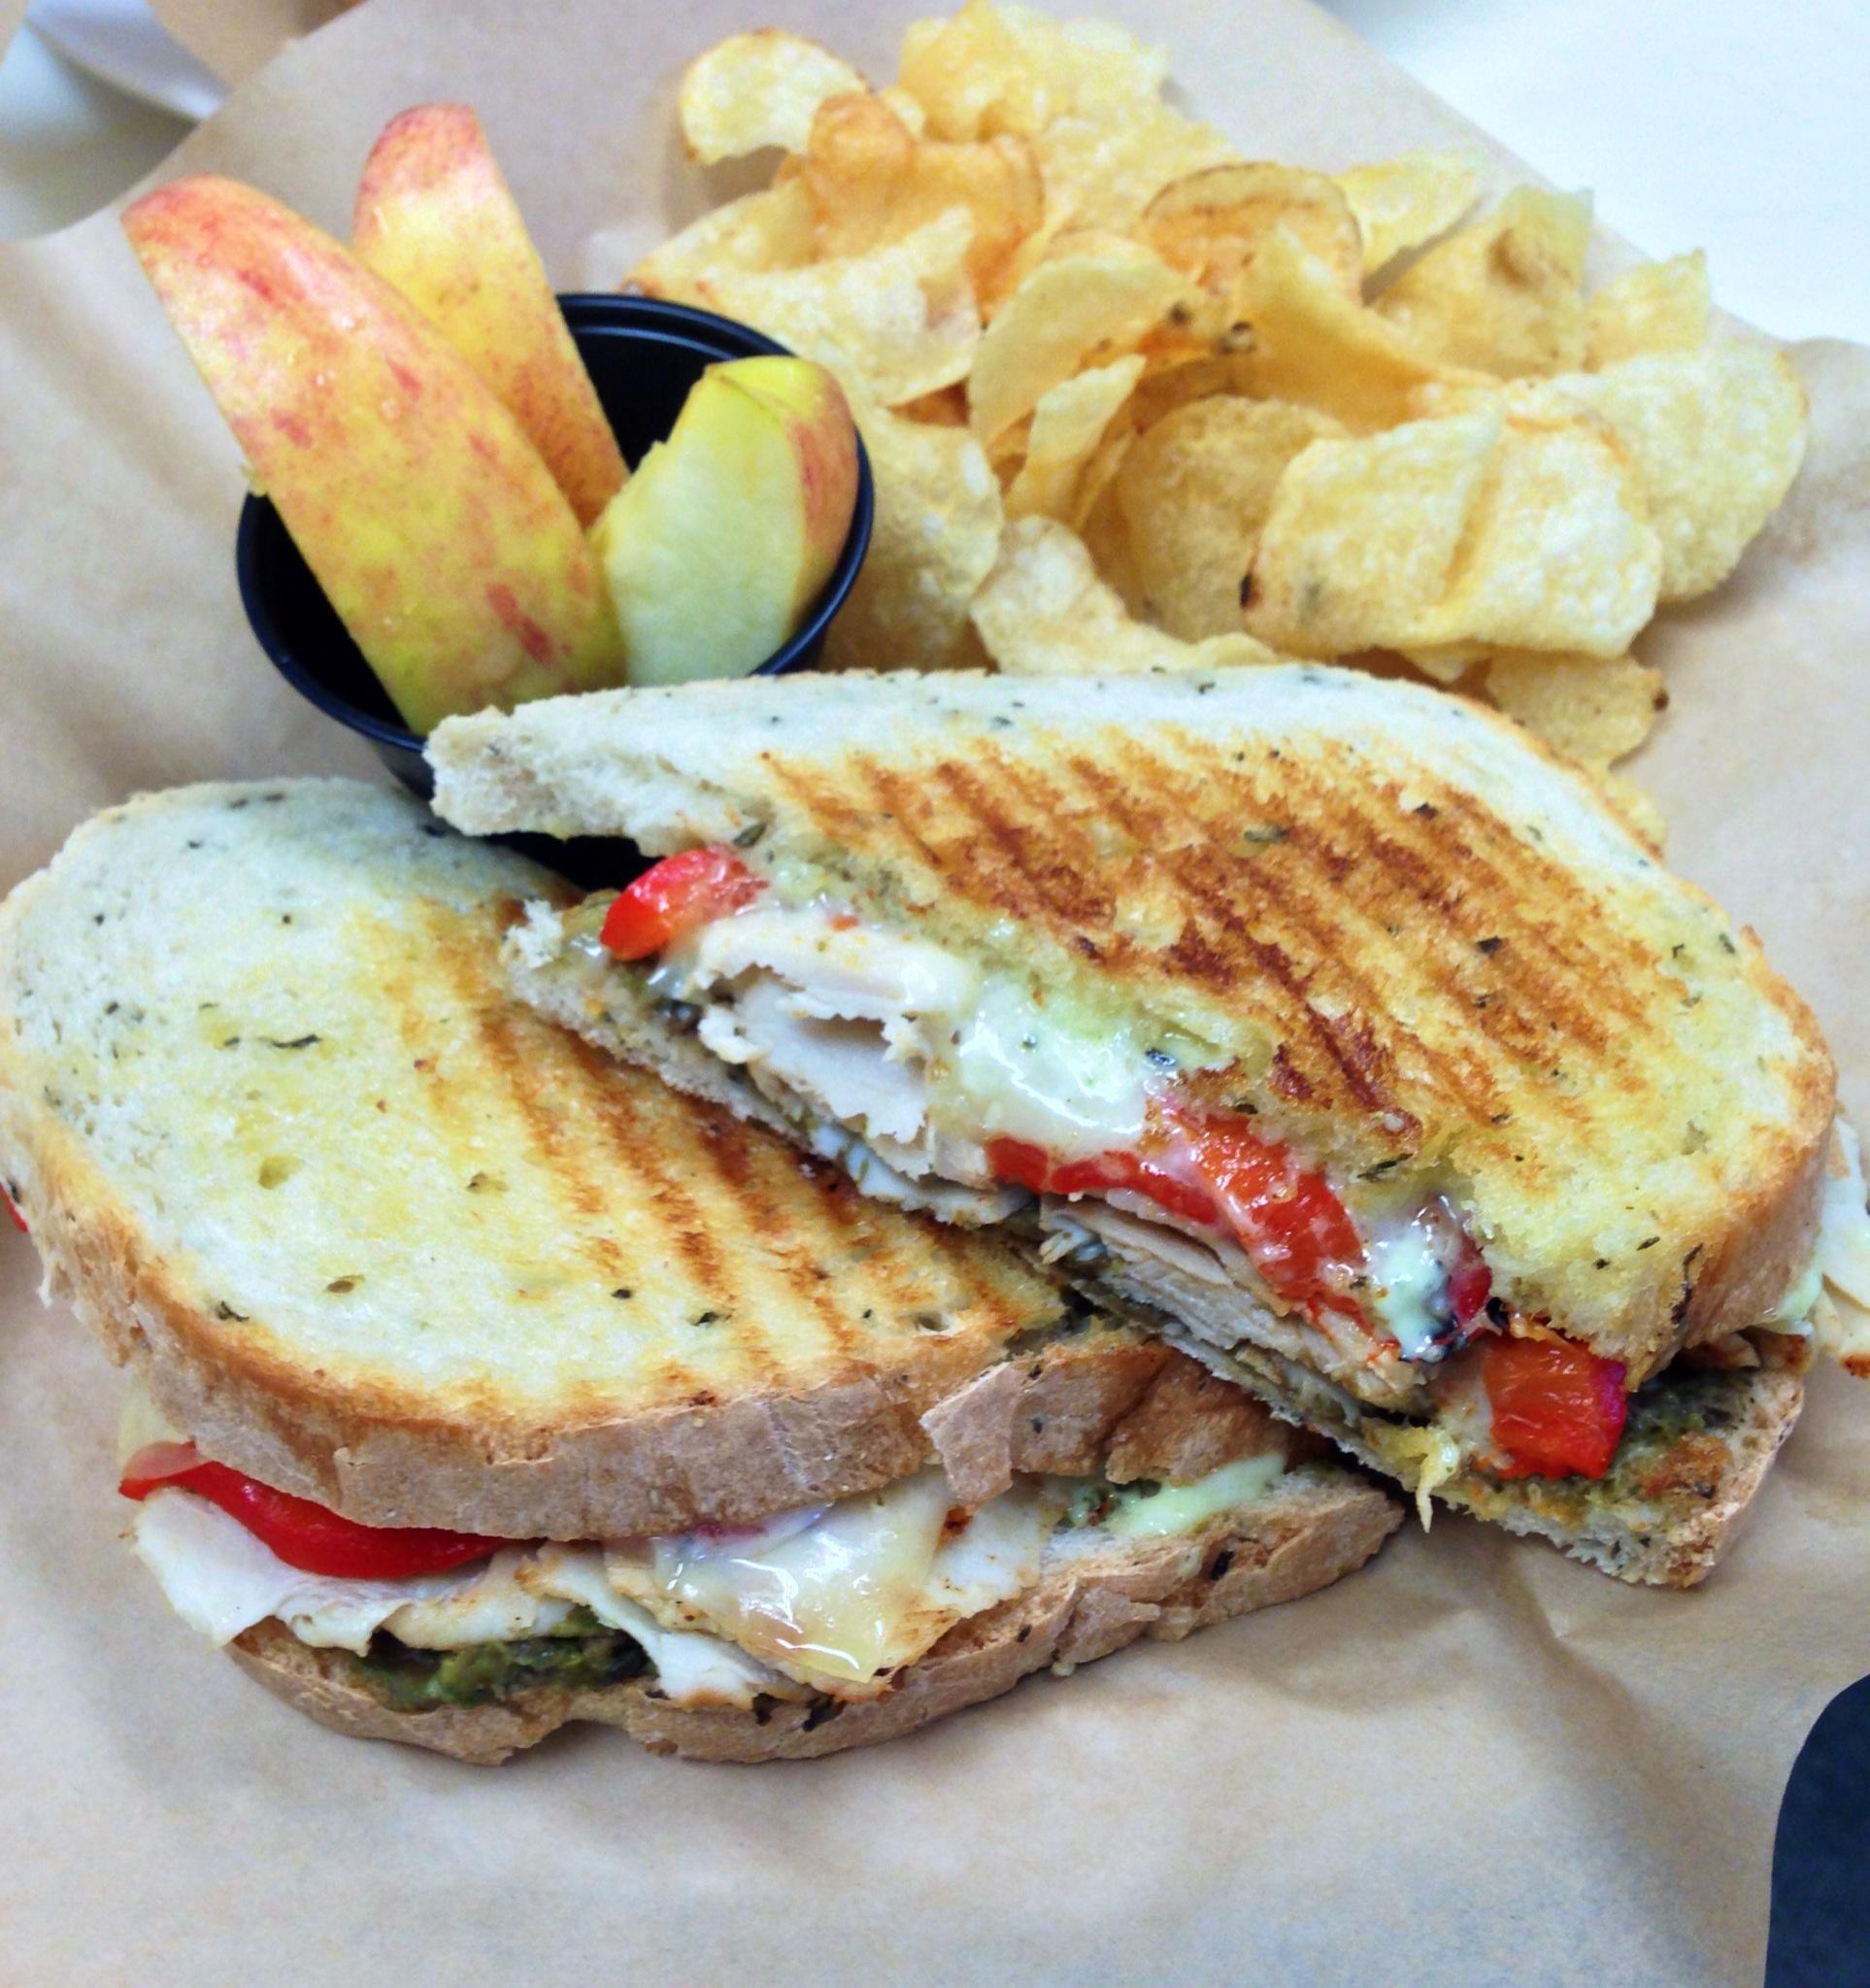 Friske Farm Market Cafe sandwich to go near Charlevoix michigan